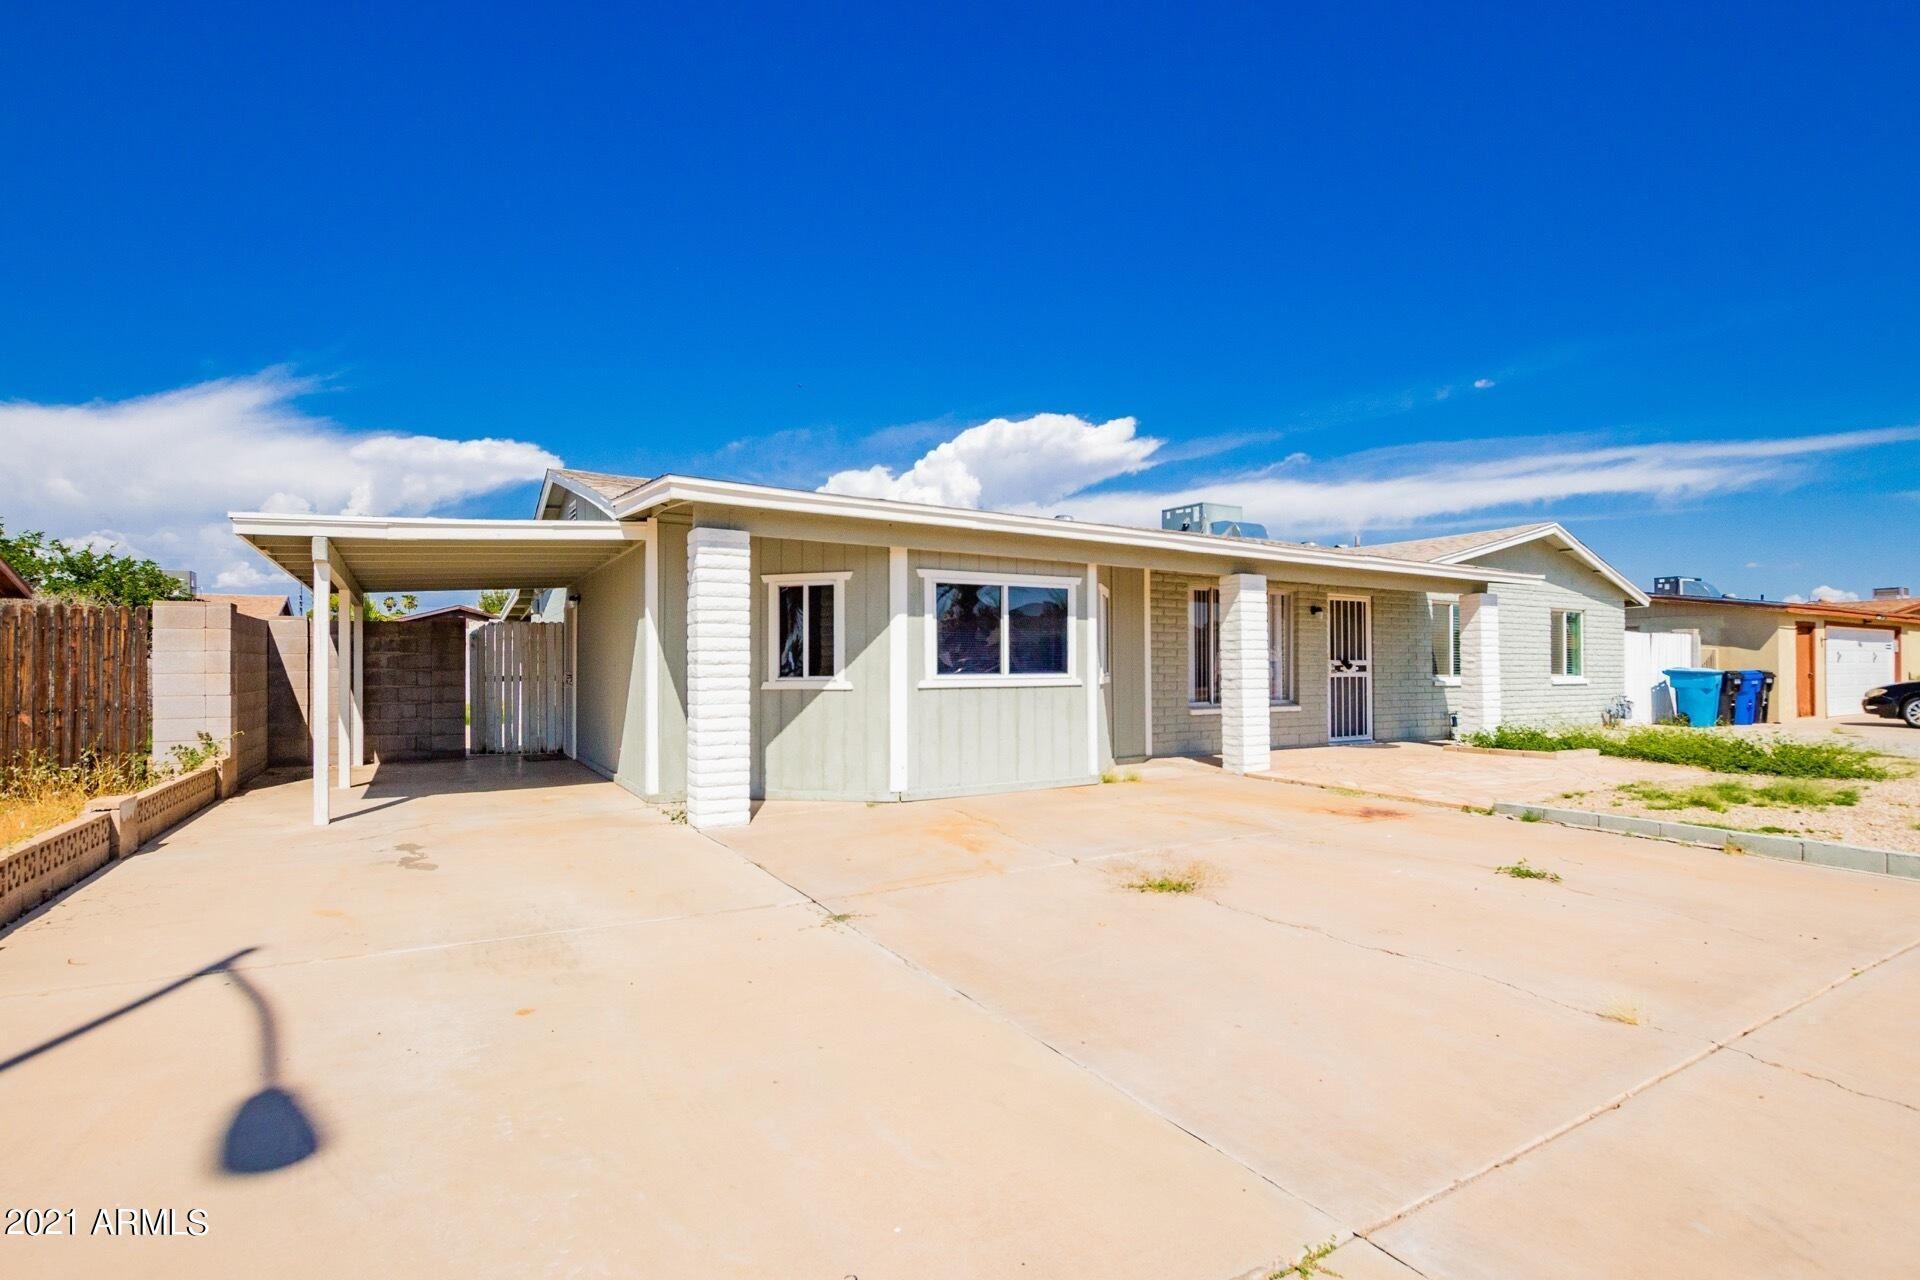 3624 W SHARON Avenue, Phoenix, AZ 85029 - MLS#: 6302556